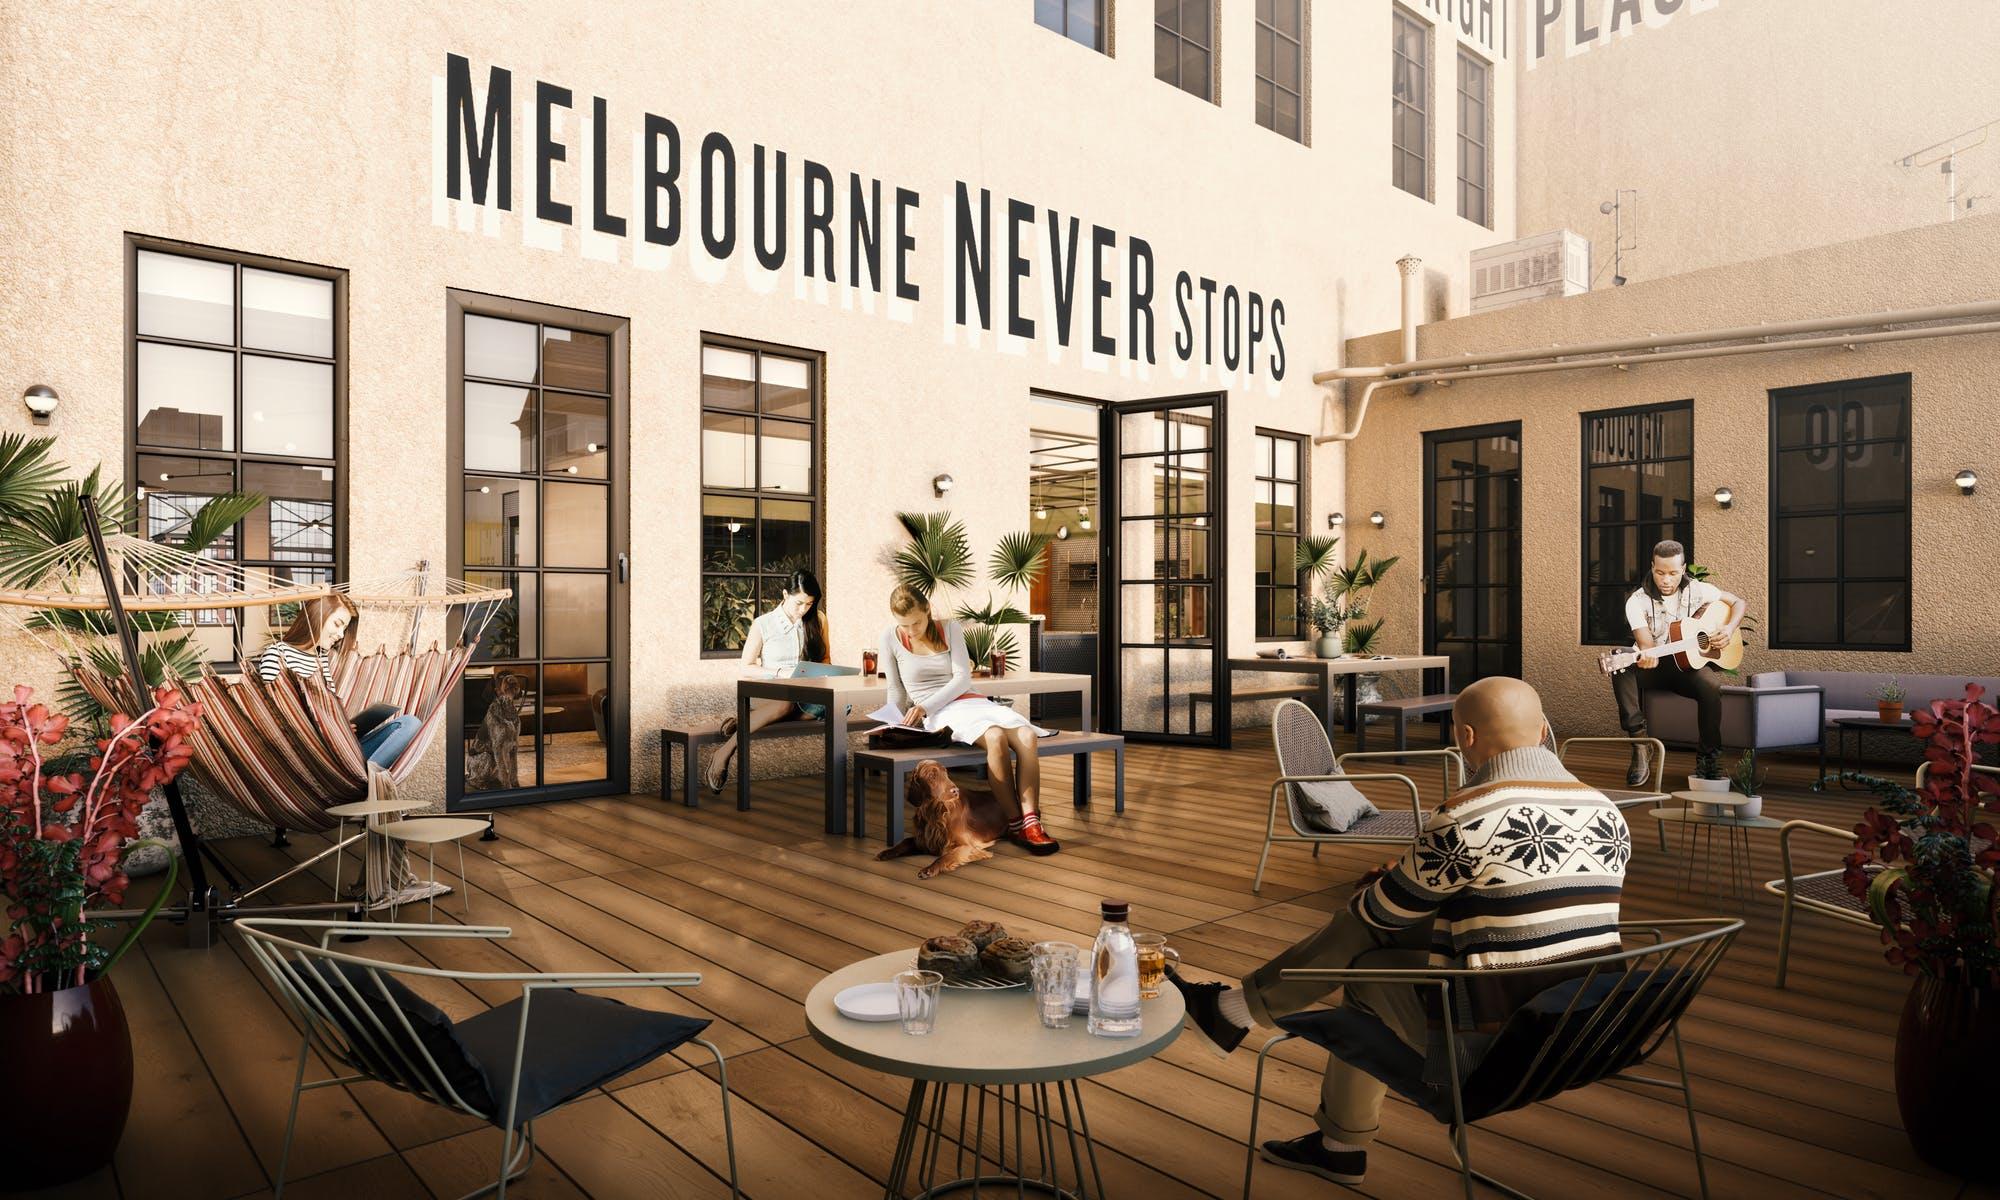 WeWork Bourke Street, Melbourne